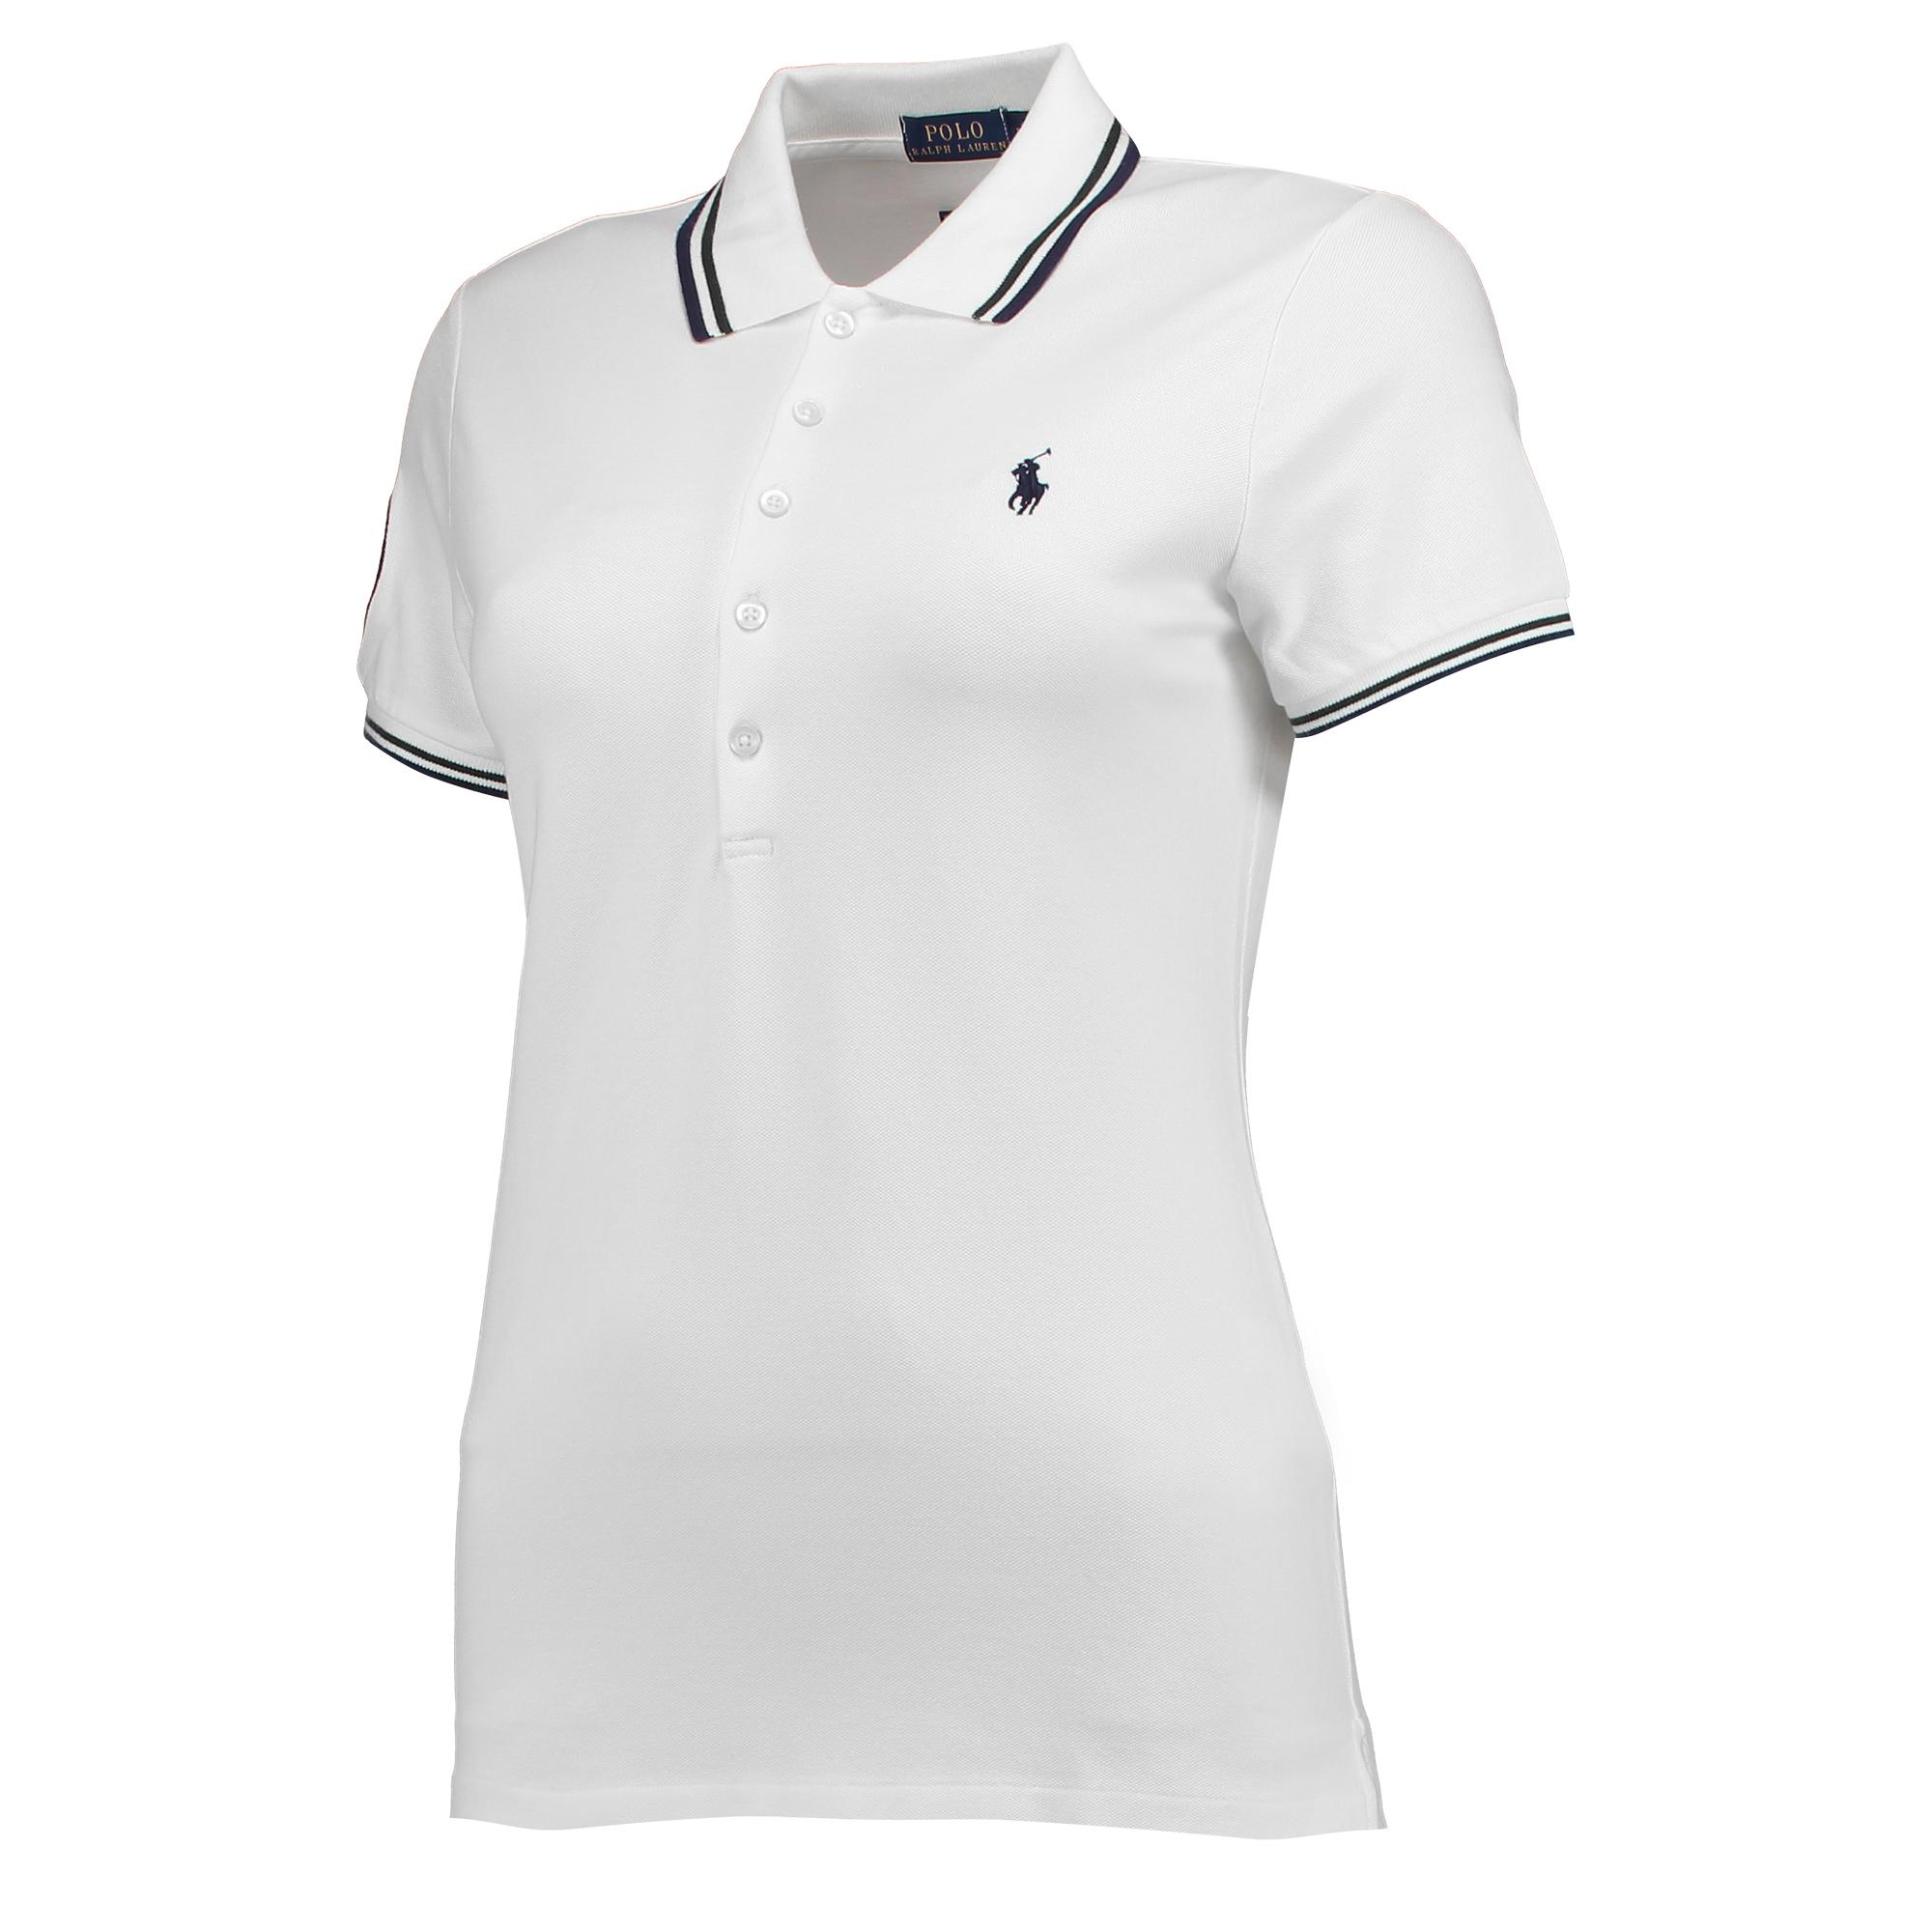 Wimbledon Ralph Lauren Polo - White - Ladies